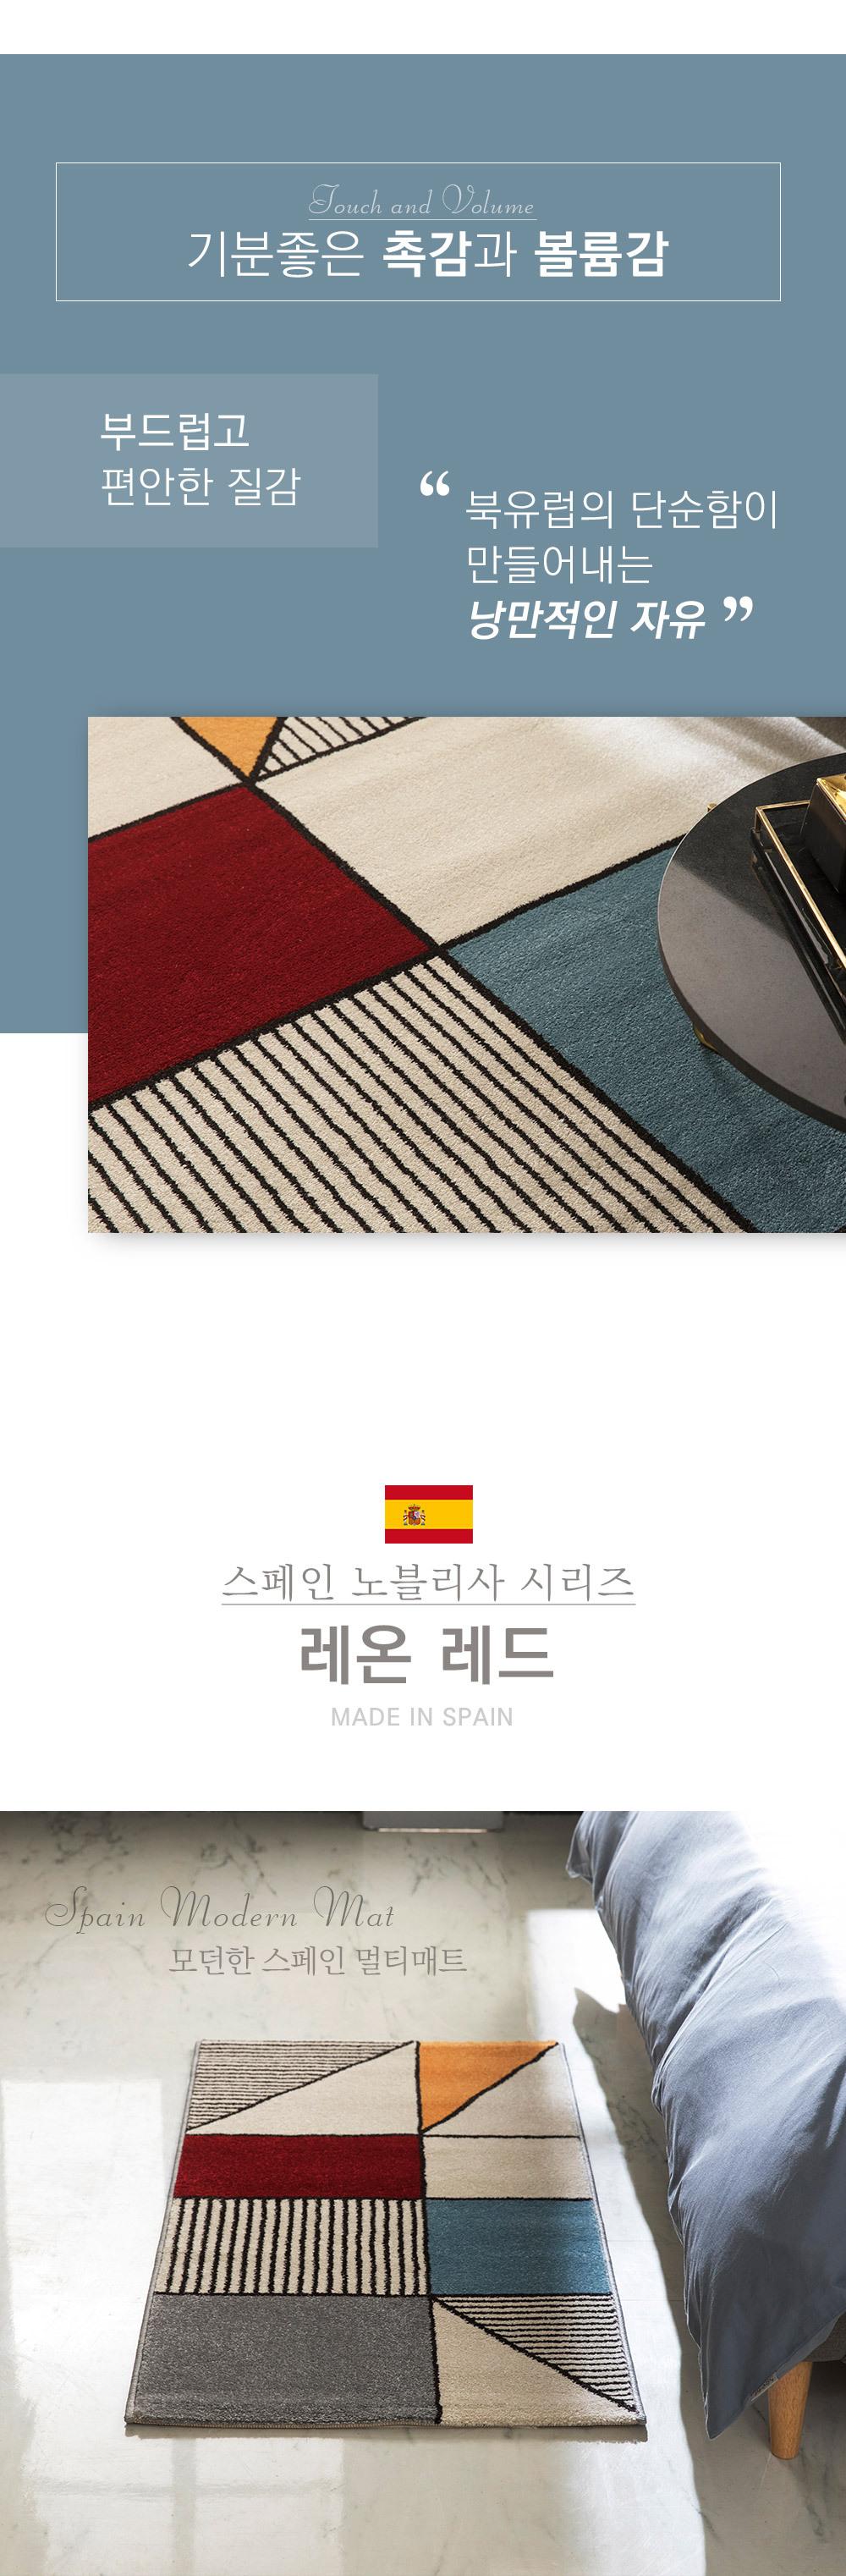 spain nobleza carpet soft touch - Leon